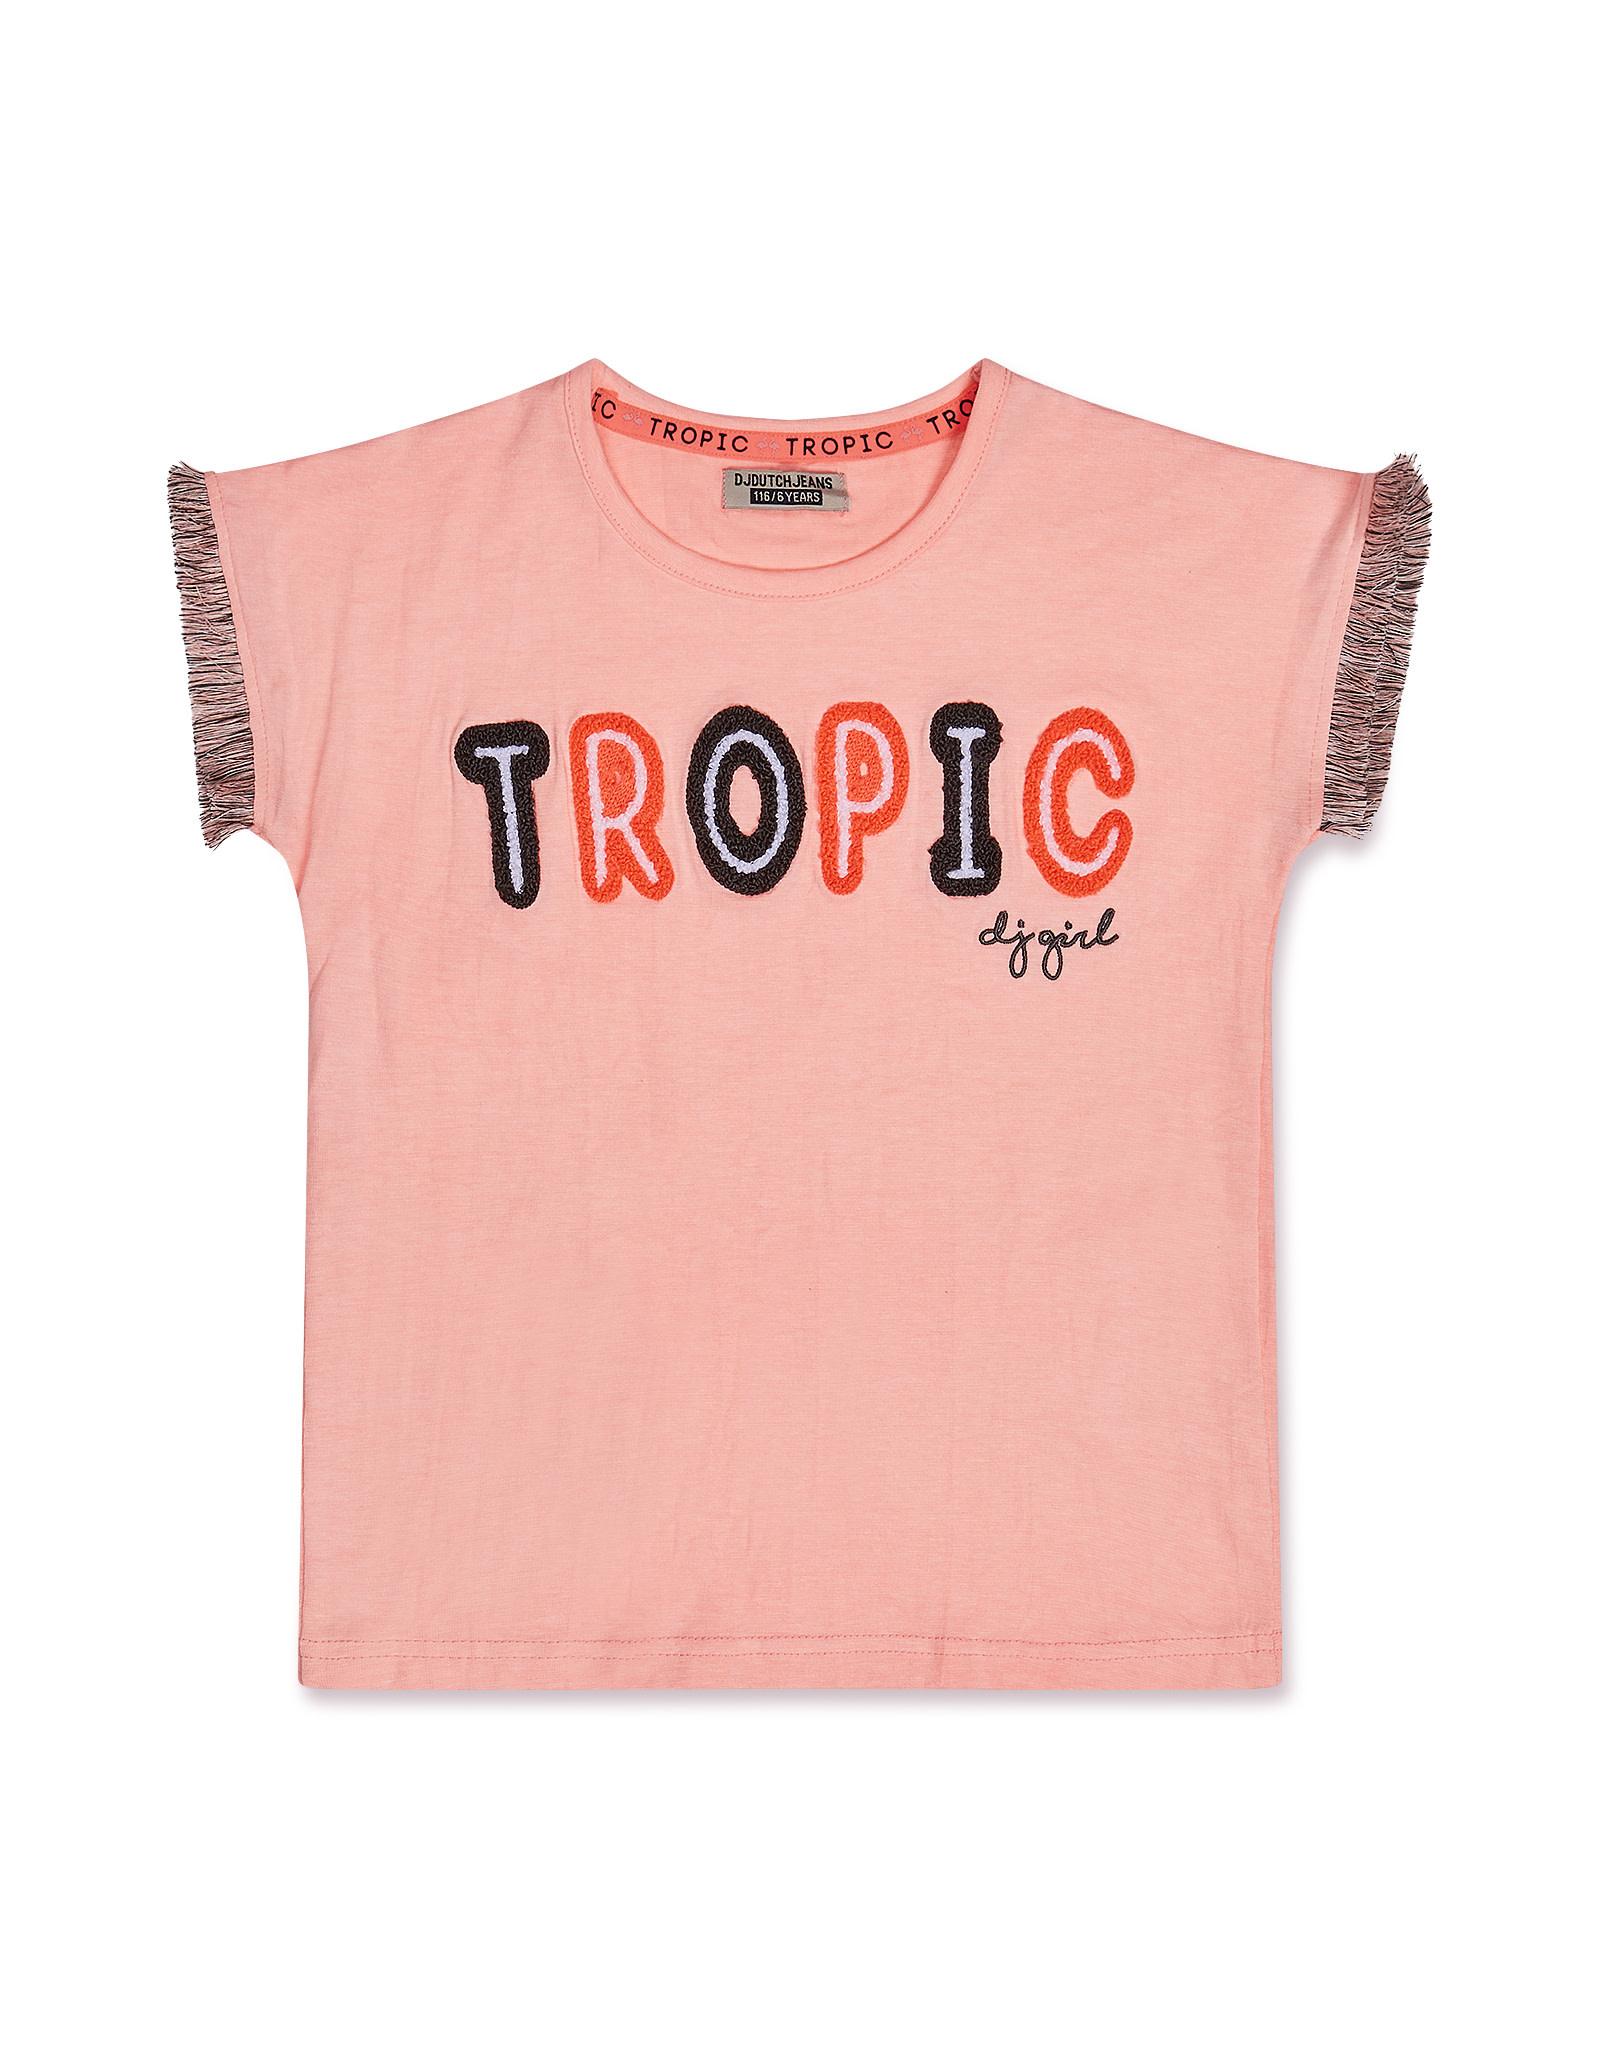 Tropical Girl Tee